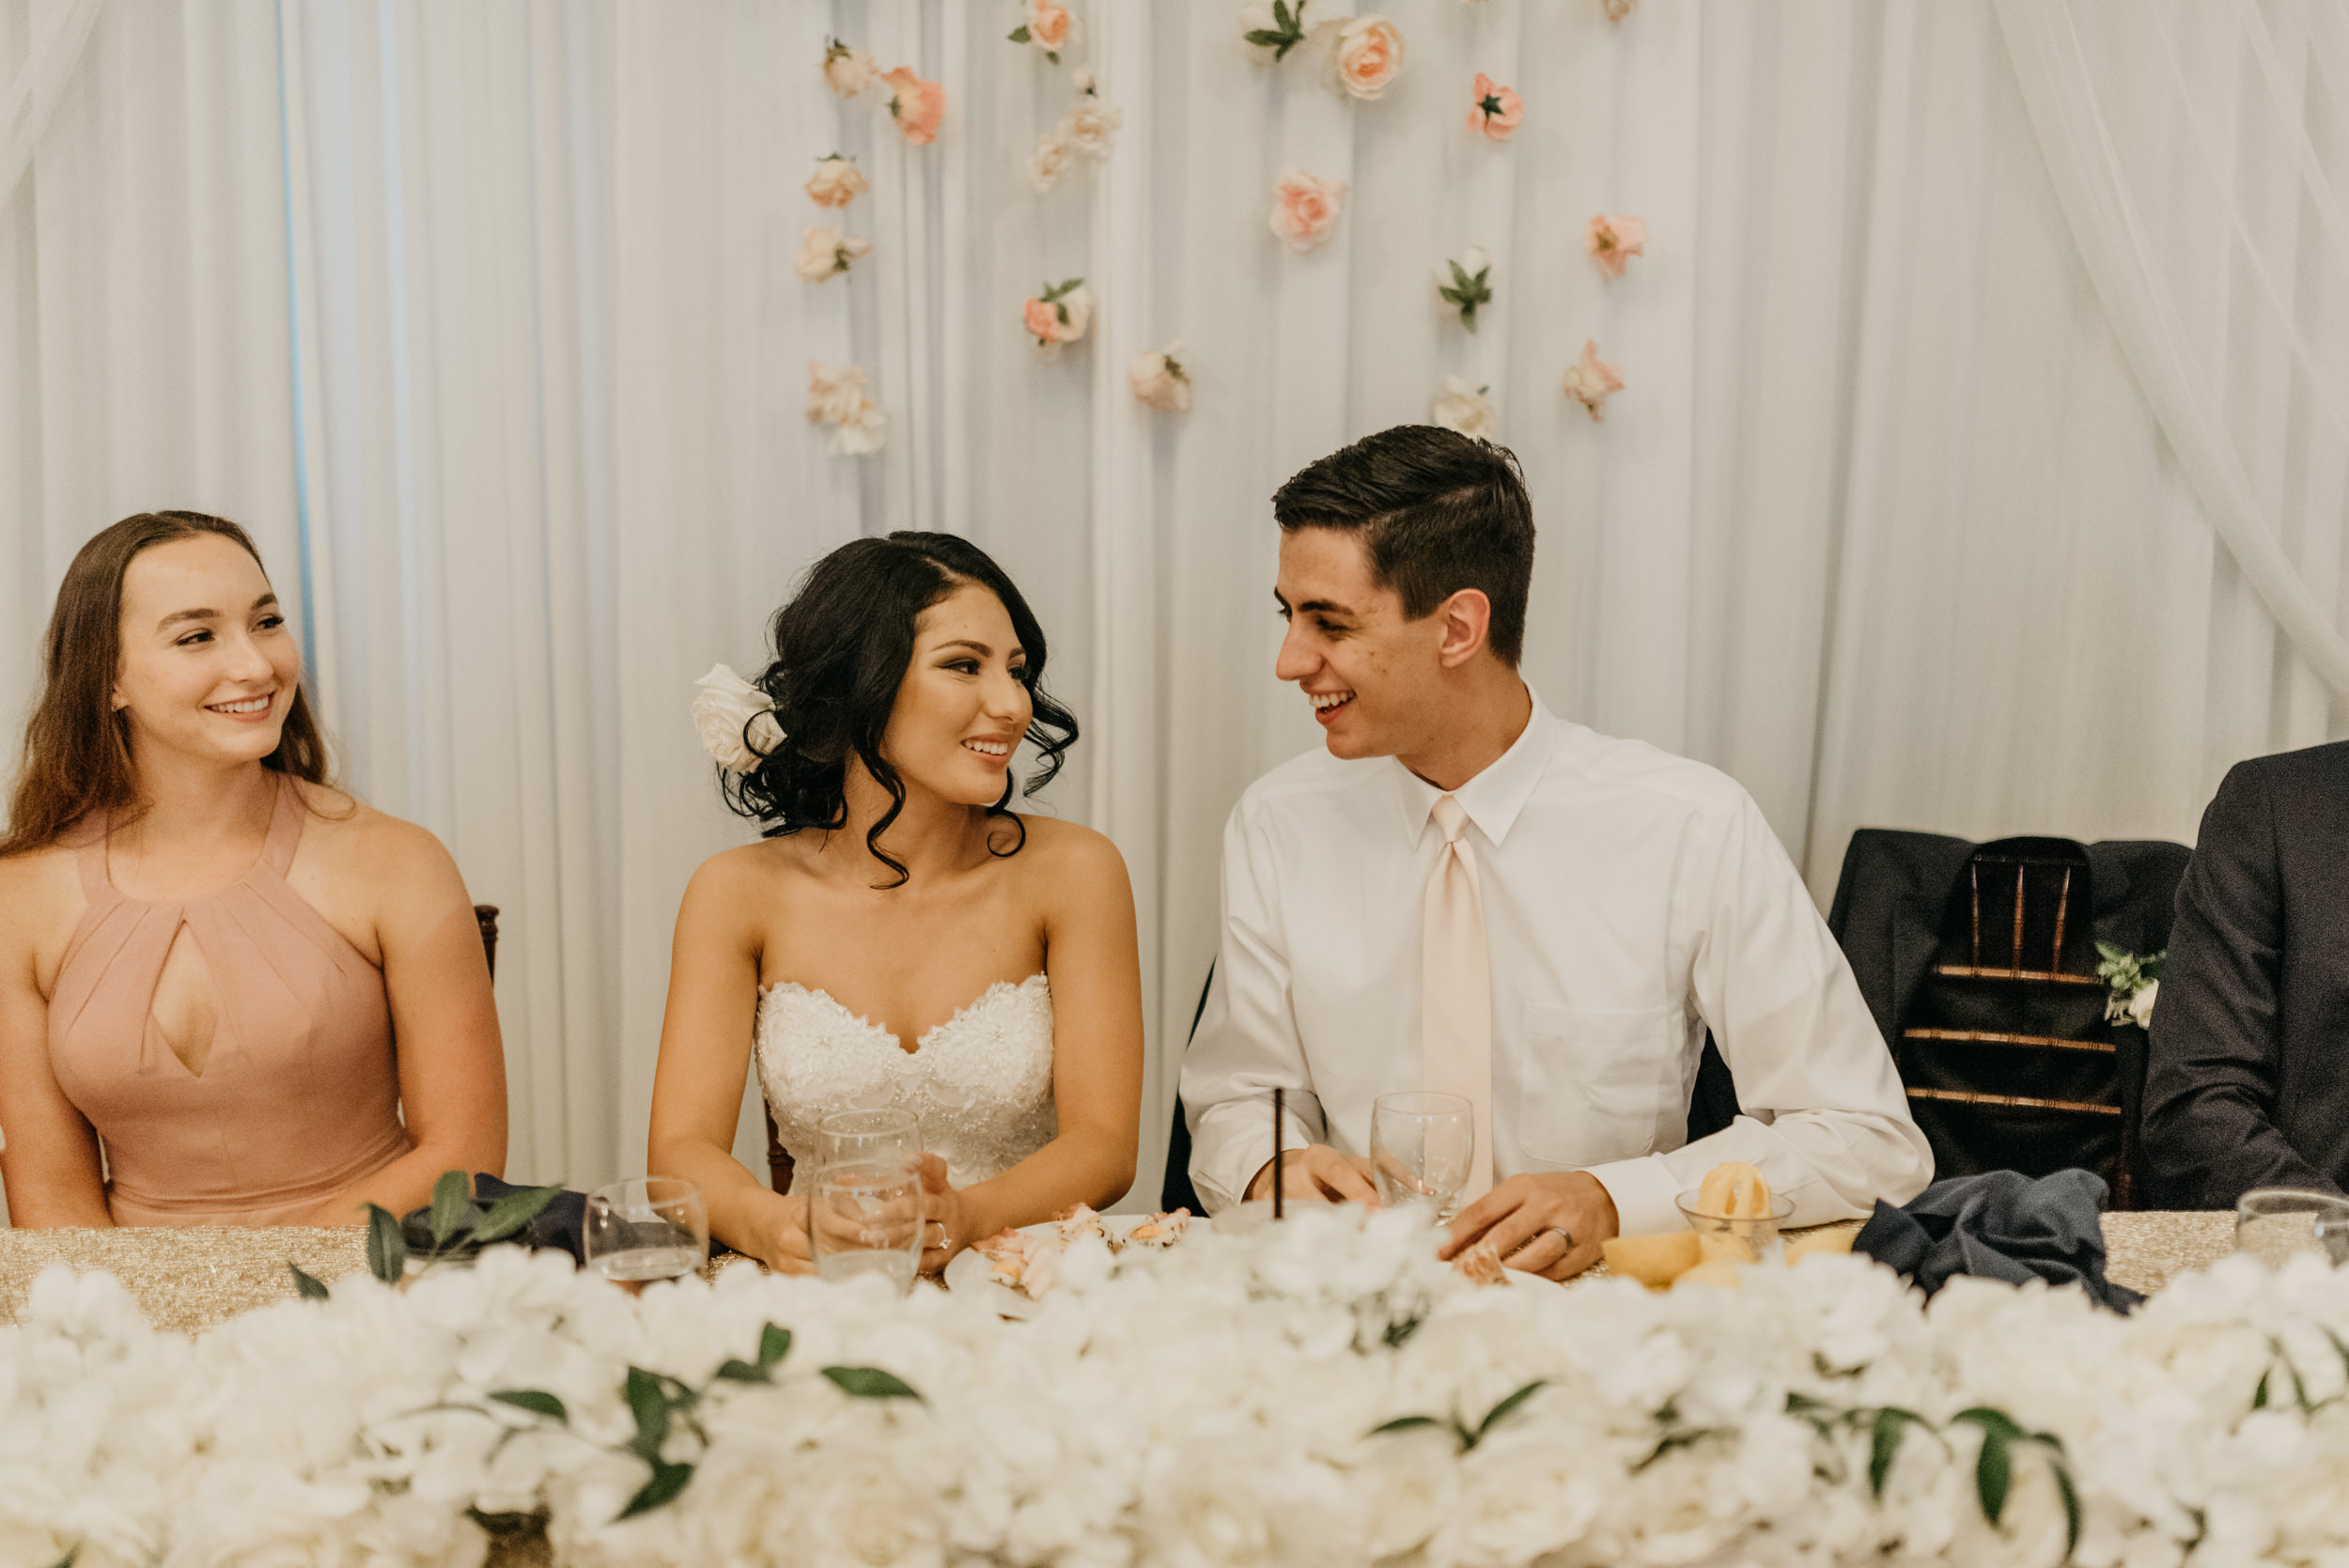 108-reception-west-end-ballroom-portland-wedding-photographer-8467.jpg